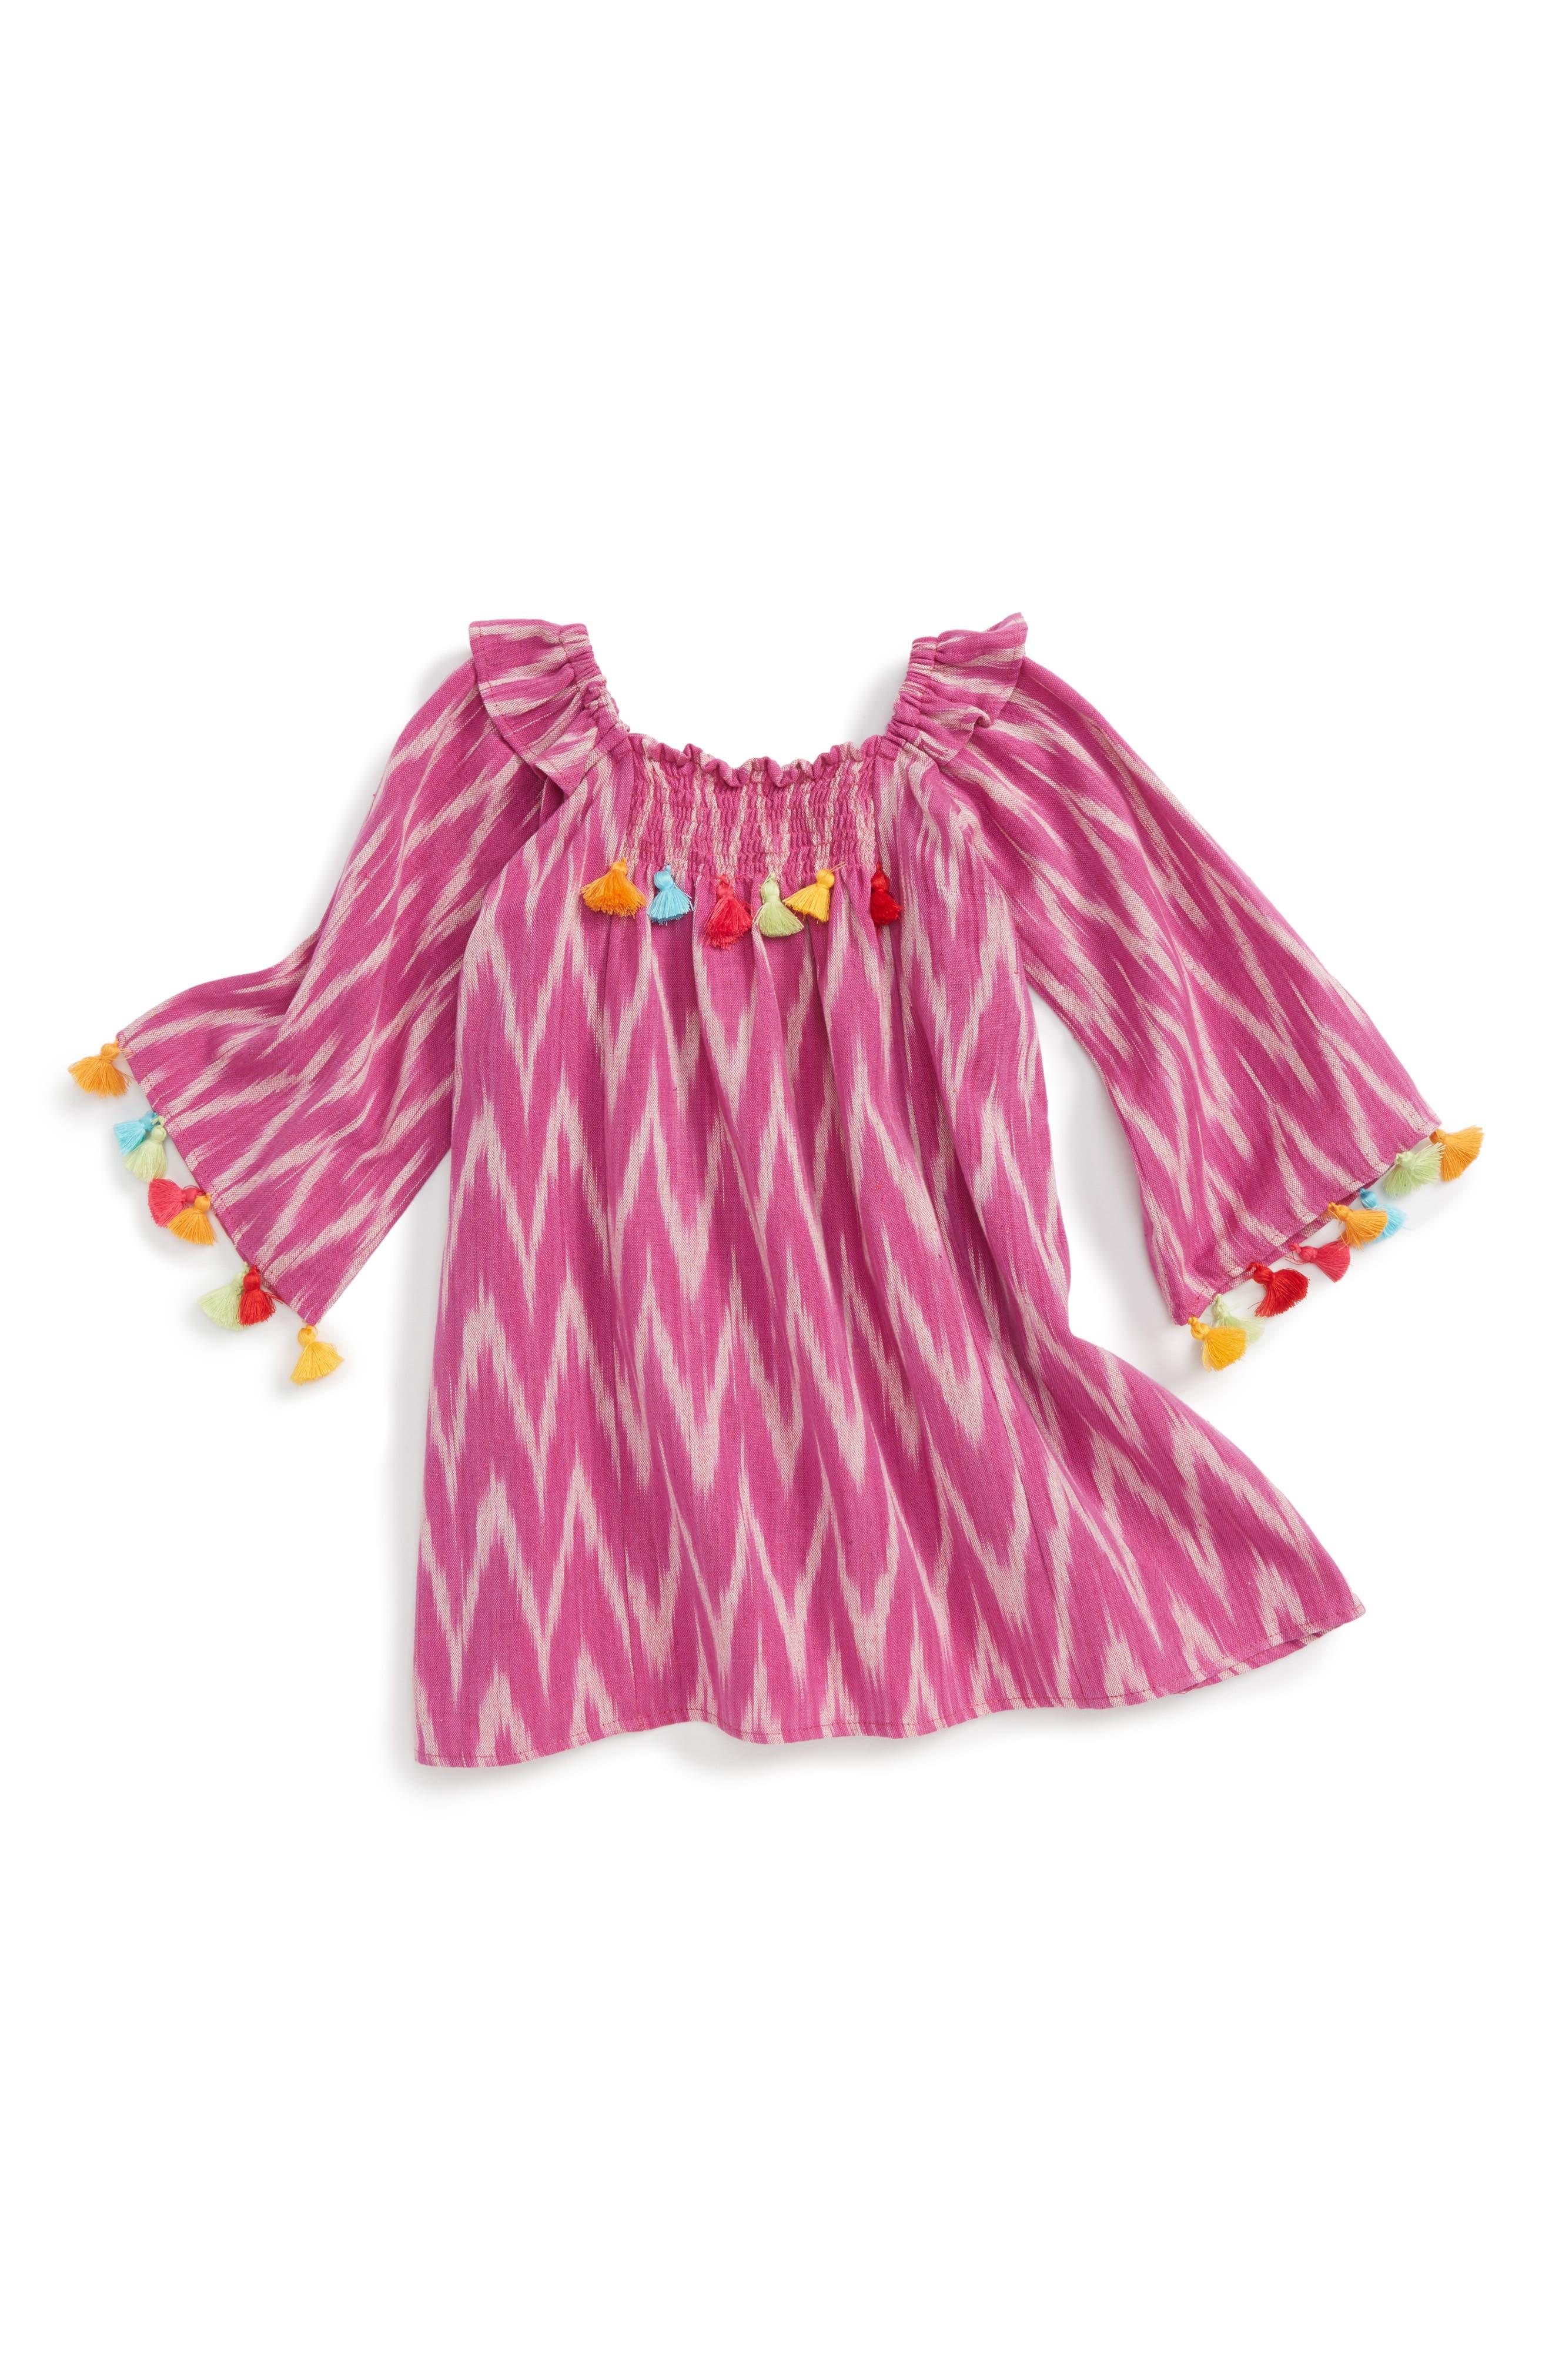 Alternate Image 1 Selected - Masalababy Ekta Tassel Trim Dress (Baby Girls)